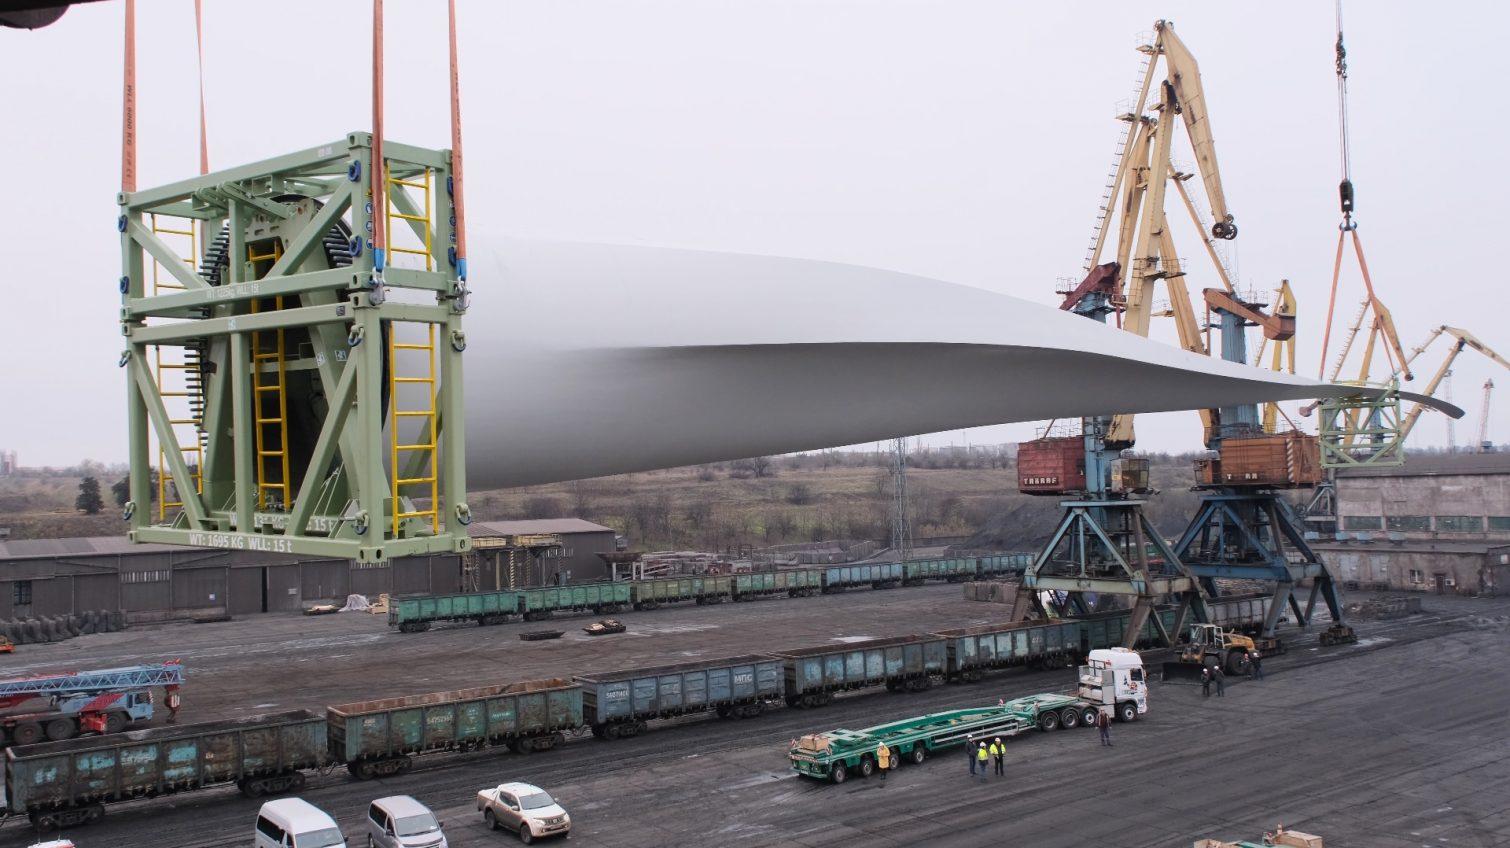 Гигантские лопасти ветряков разгрузили с судна в порту «Южный» (фото, видео) «фото»